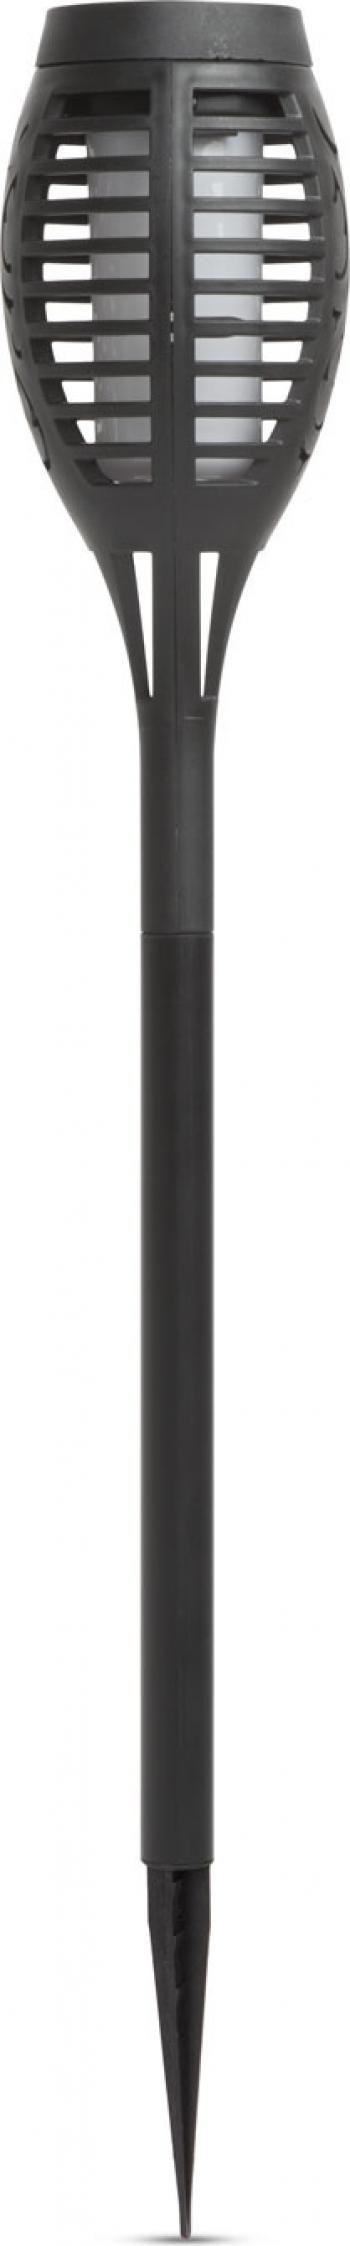 Set 4 buc Lampa Solara LED tip Torta cu Imitatie Flacara Miscatoare Inaltime 48cm Corpuri de iluminat